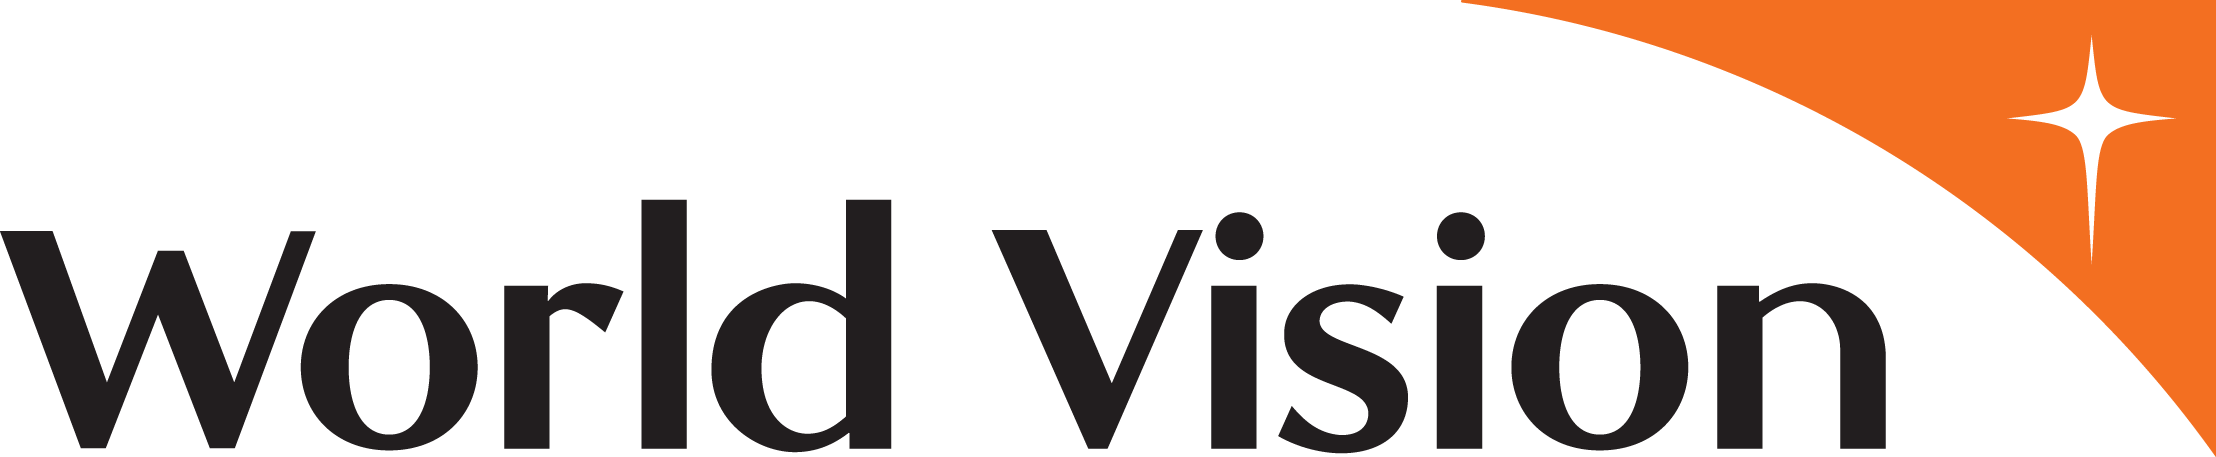 wv-logo-new-PMS1505.png